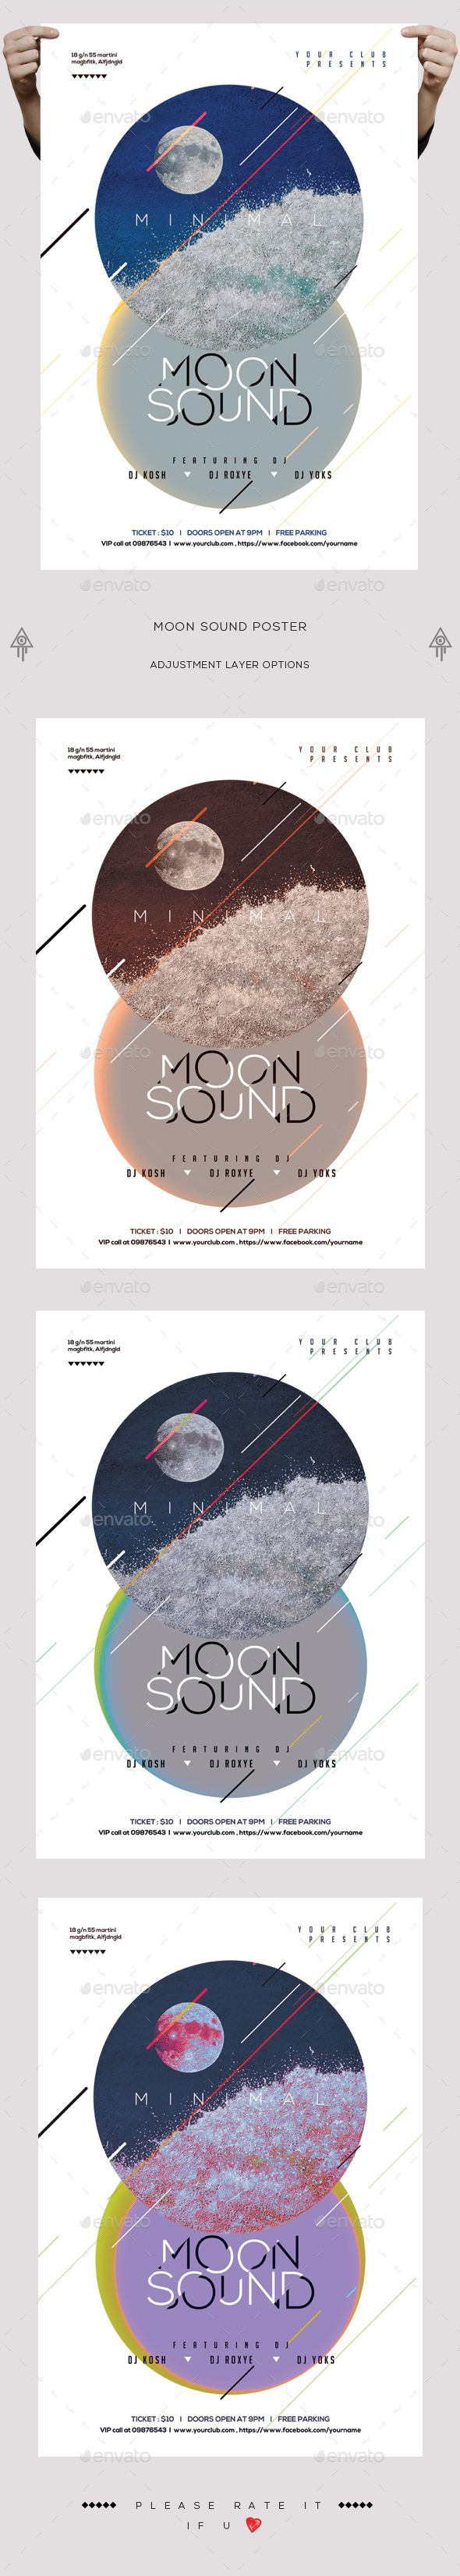 Minimal Moon Sound PSD Flyer/Poster — Photoshop PSD #dj #dark moon • Download ➝ https://graphicriver.net/item/minimal-moon-sound-psd-flyerposter/19198180?ref=pxcr